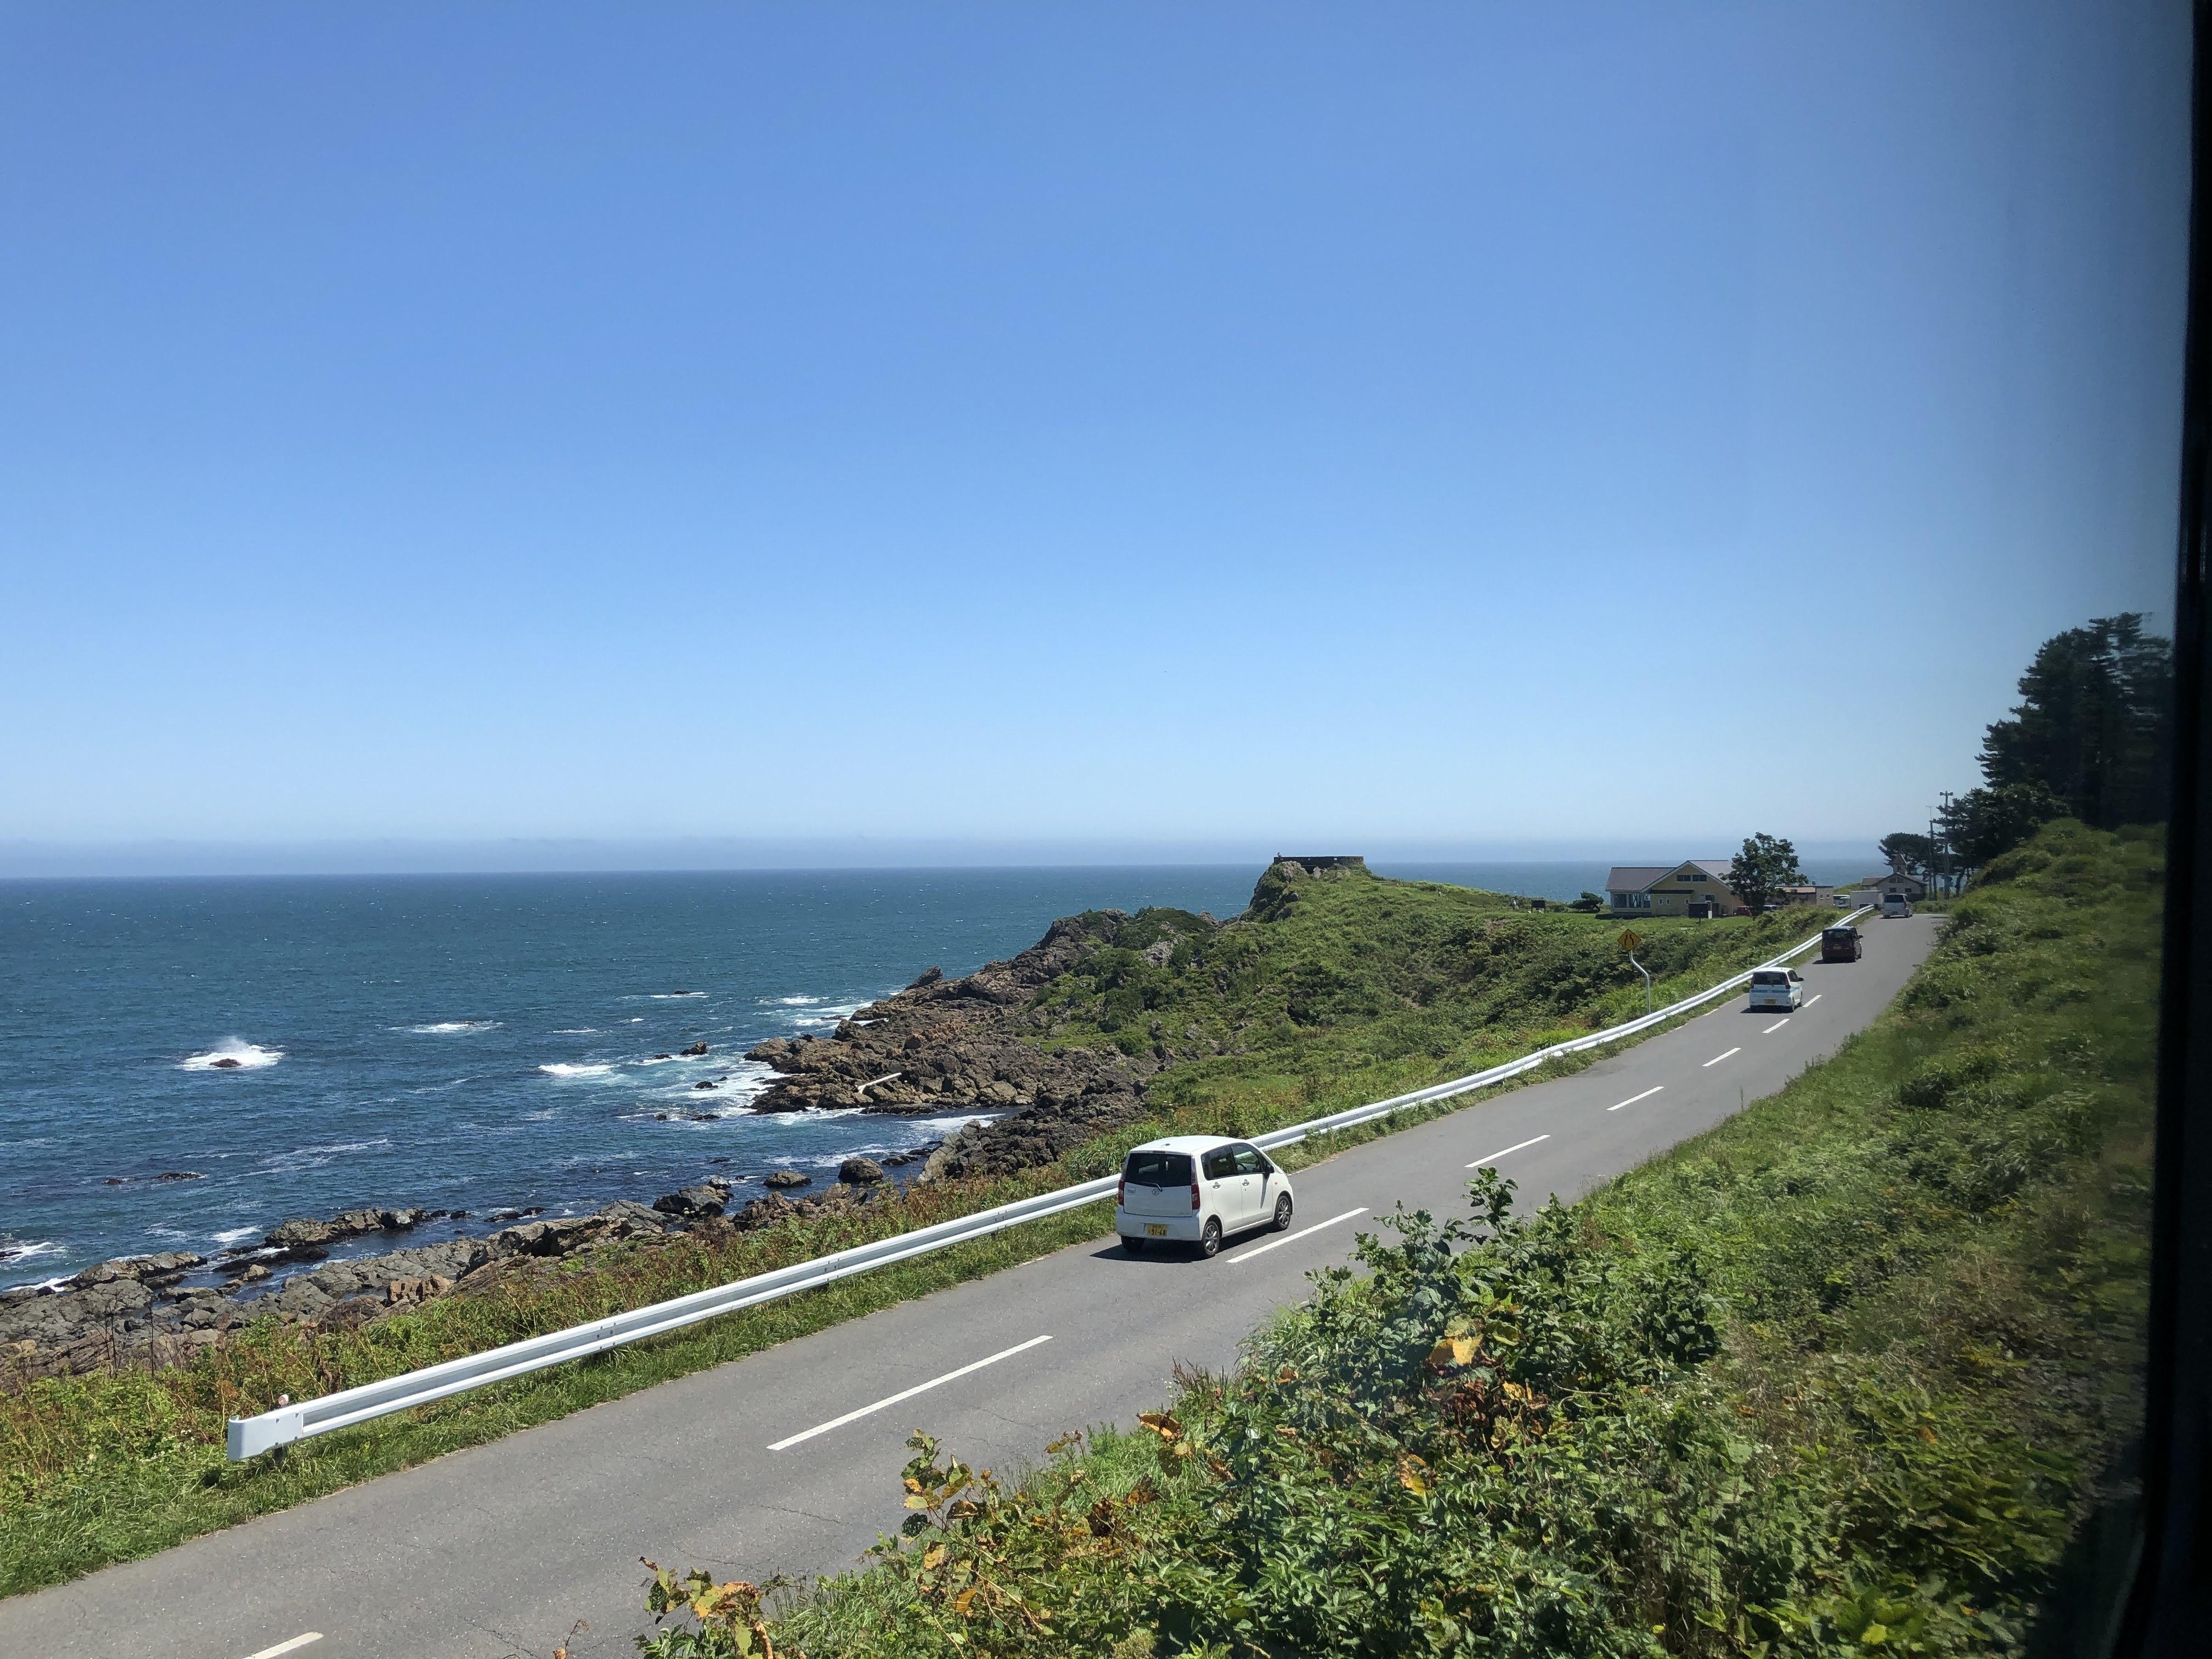 TOHOKU EMOTION に乗って太平洋を眺める_1_2